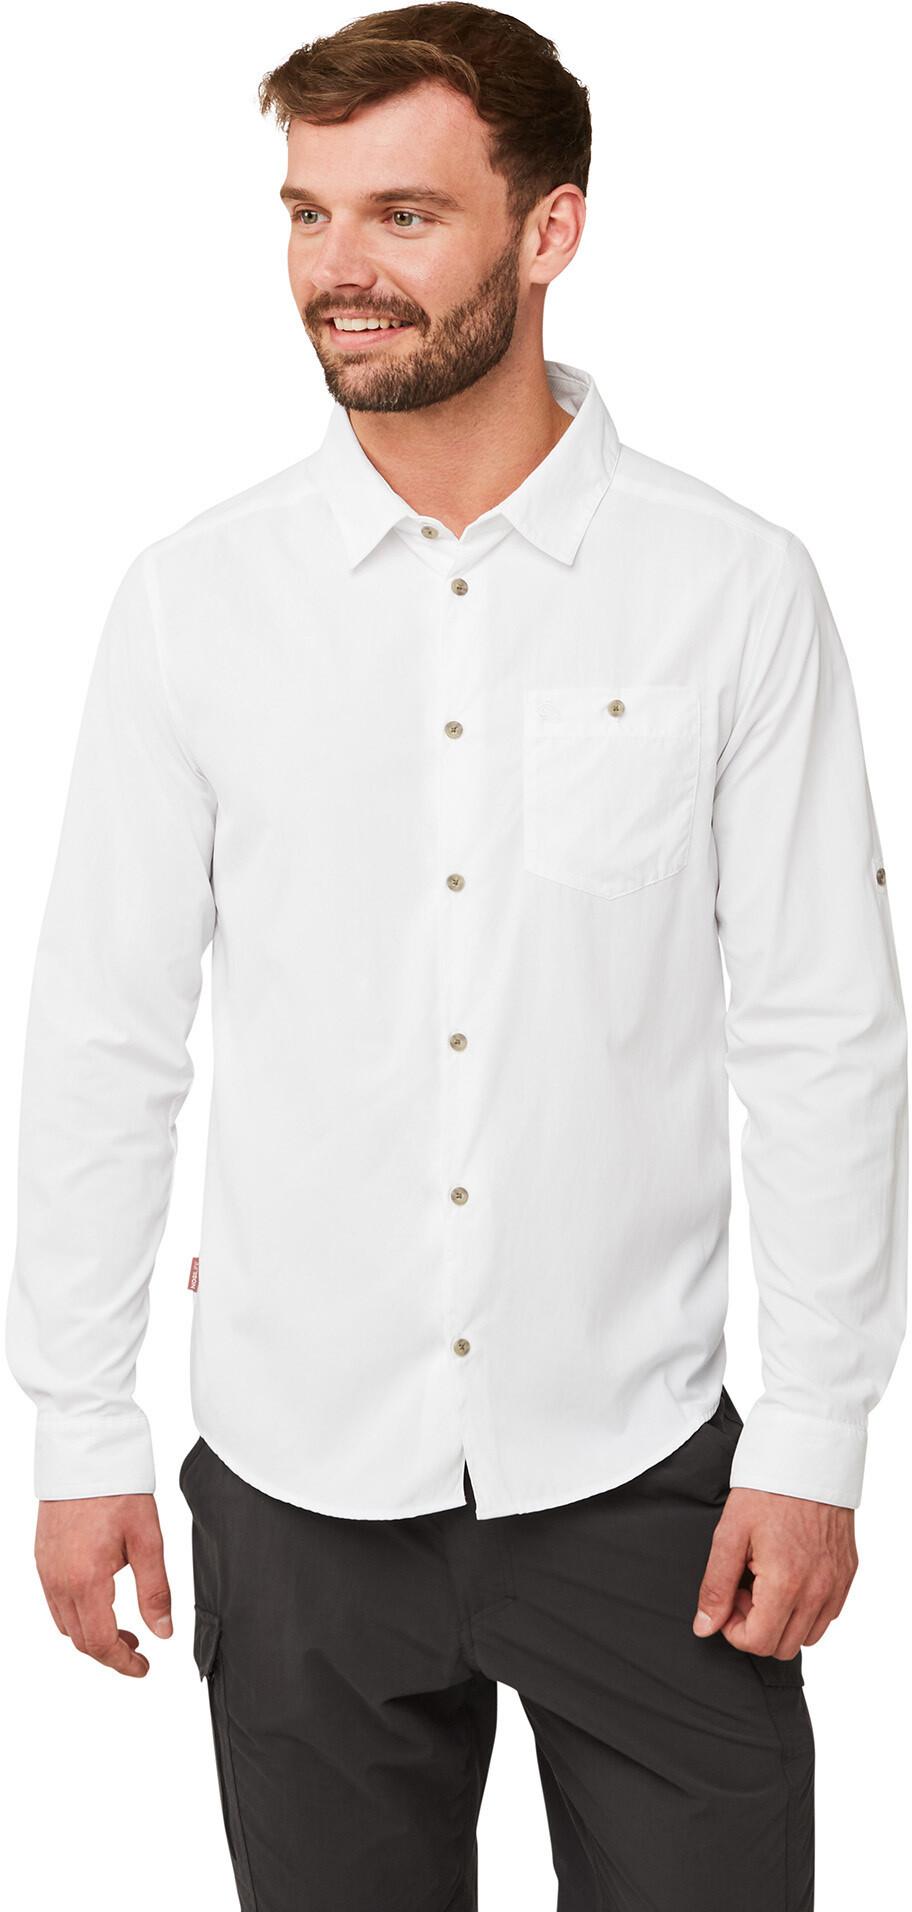 Craghoppers CR165/NosiLife Adventure Herren lang/ärmeliges Hemd